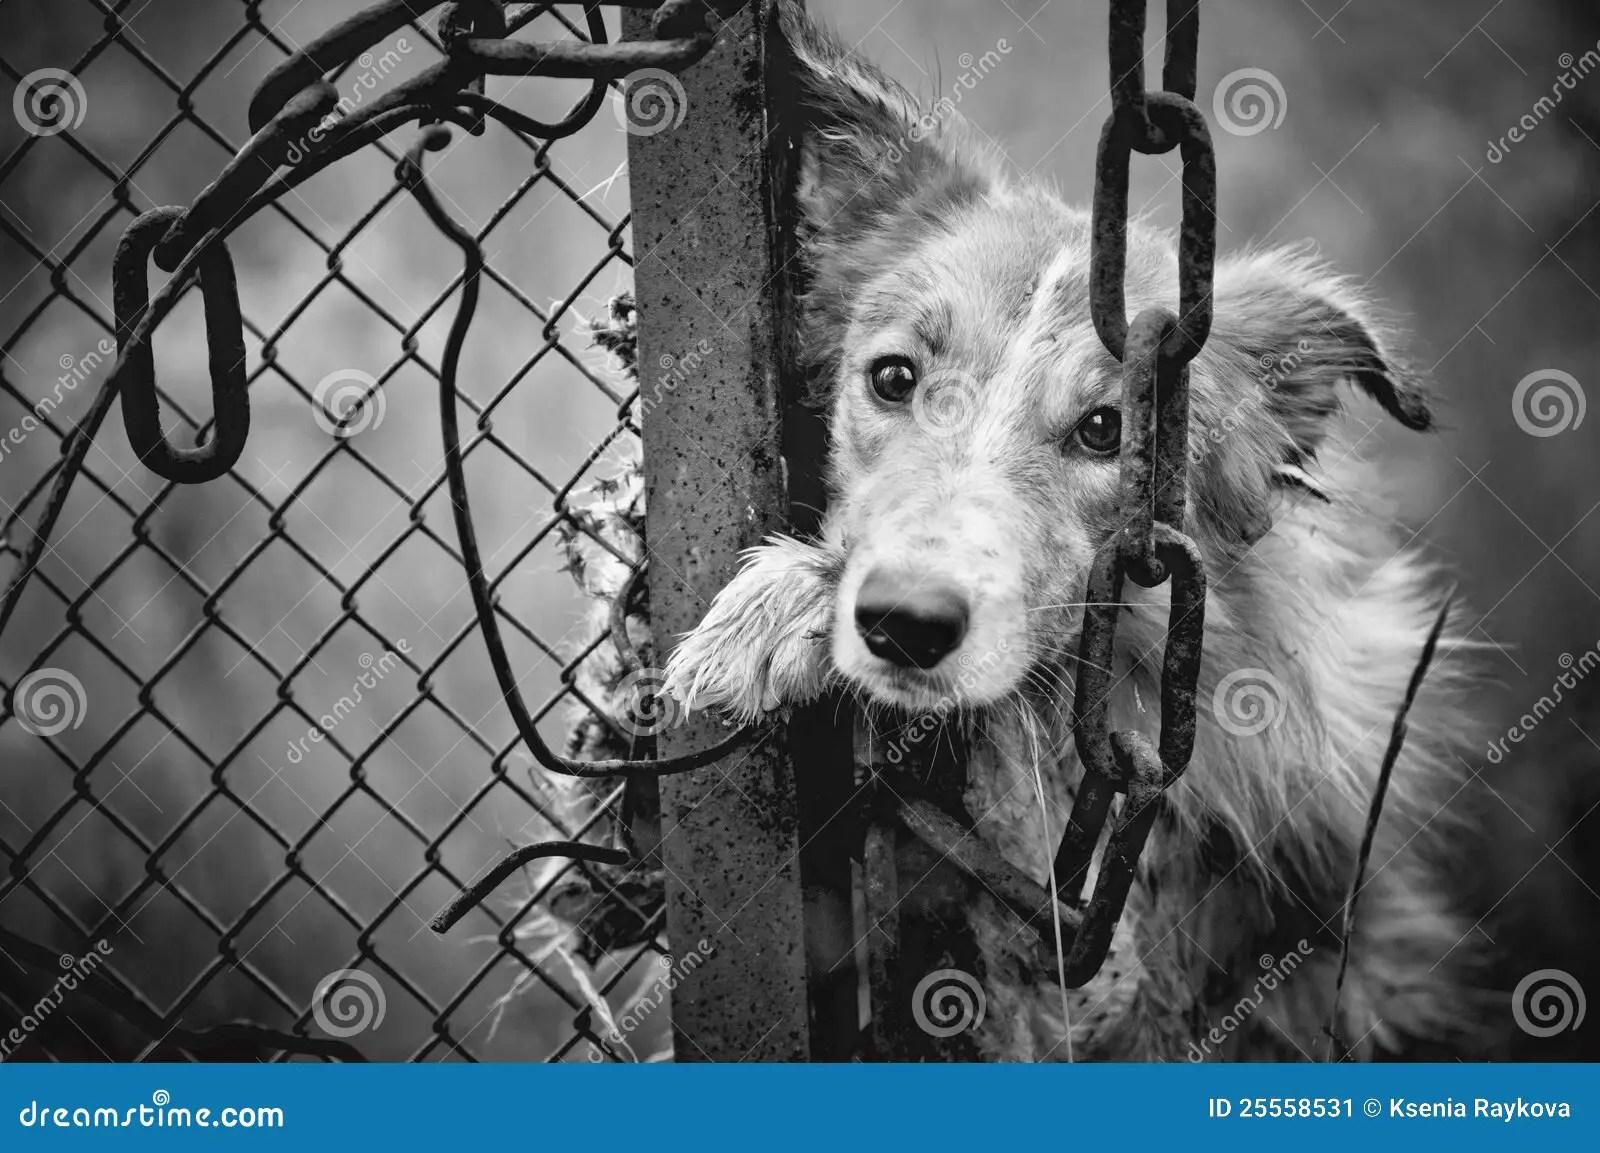 Animal Print Wallpaper Border Sad Dog Black And White Stock Image Image Of Cage Fear